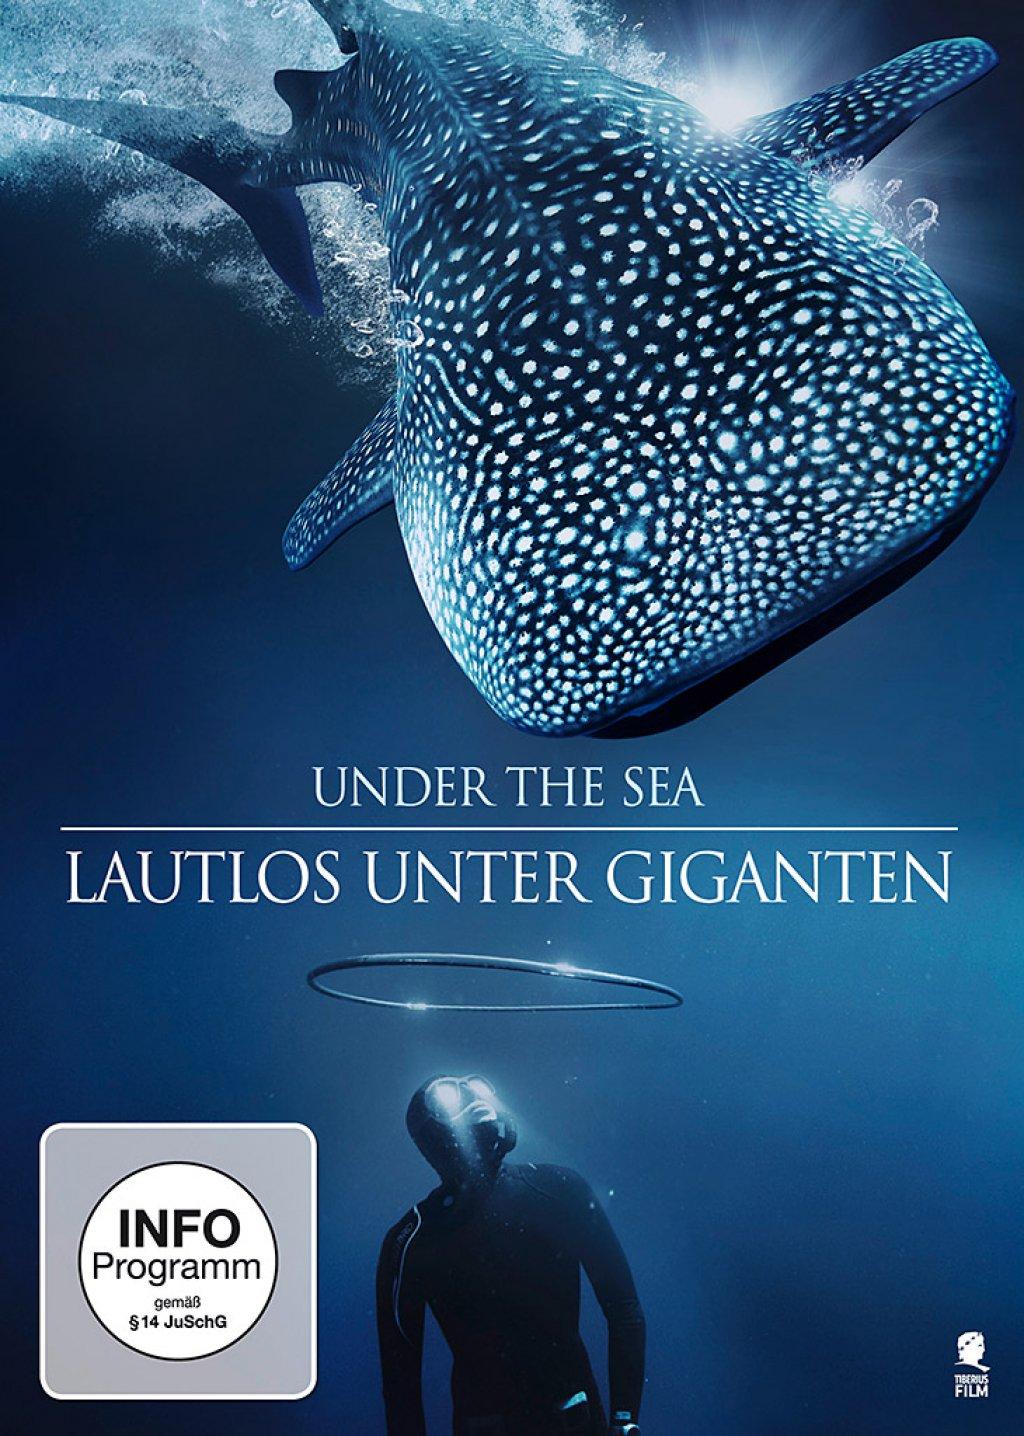 Under the Sea - Lautlos unter Giganten (DVD)